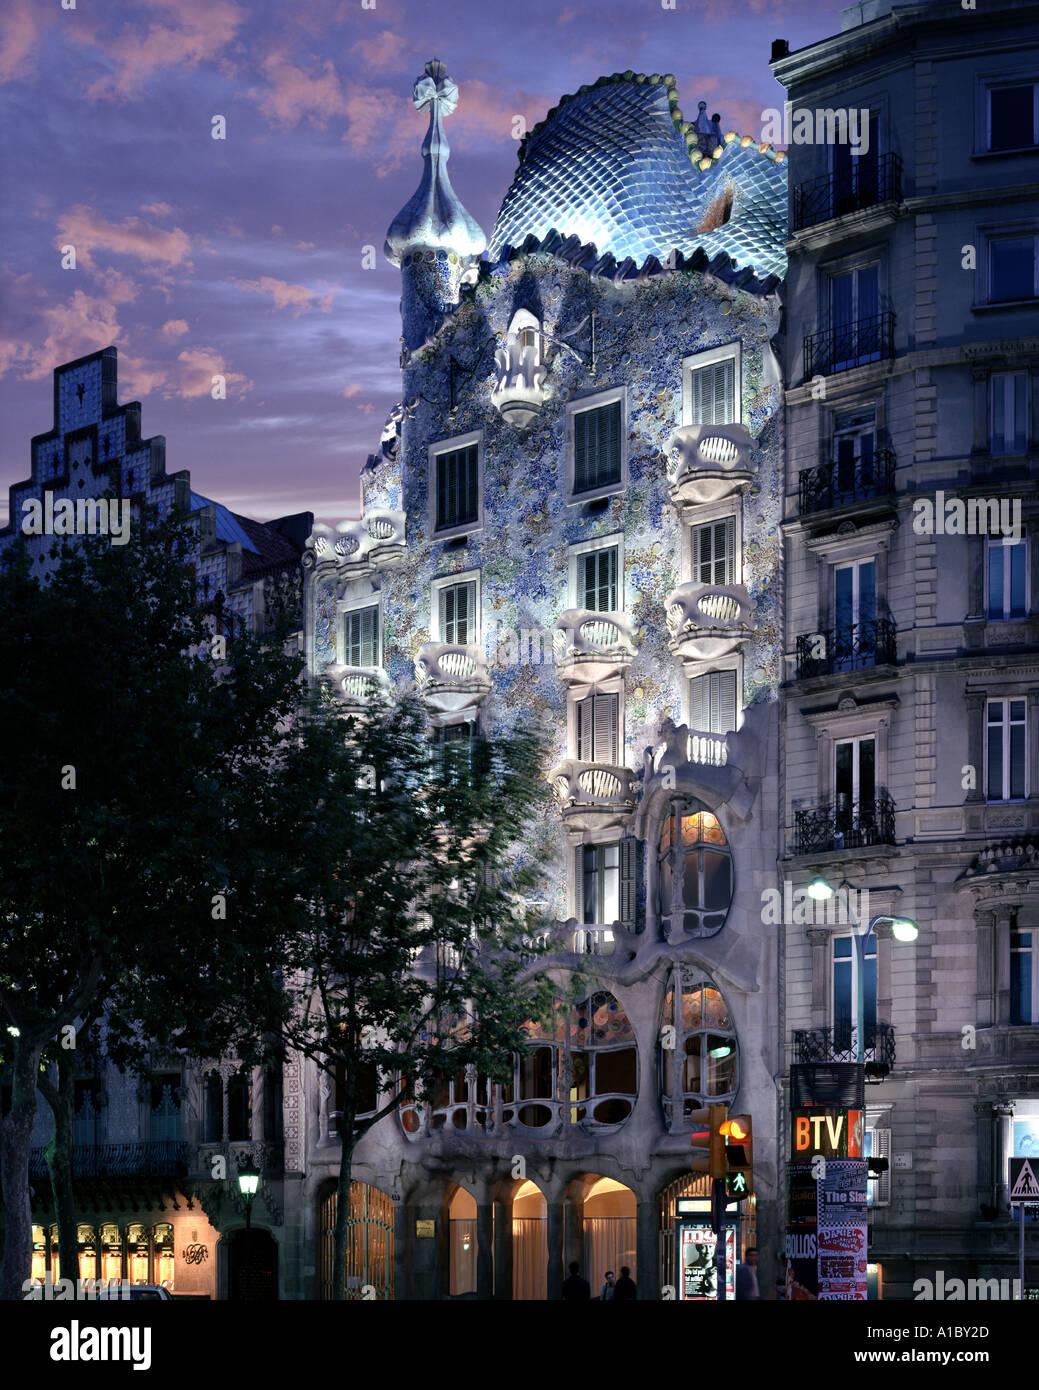 ES - BARCELONA: la Casa Batlló de Antoni Gaudí Imagen De Stock